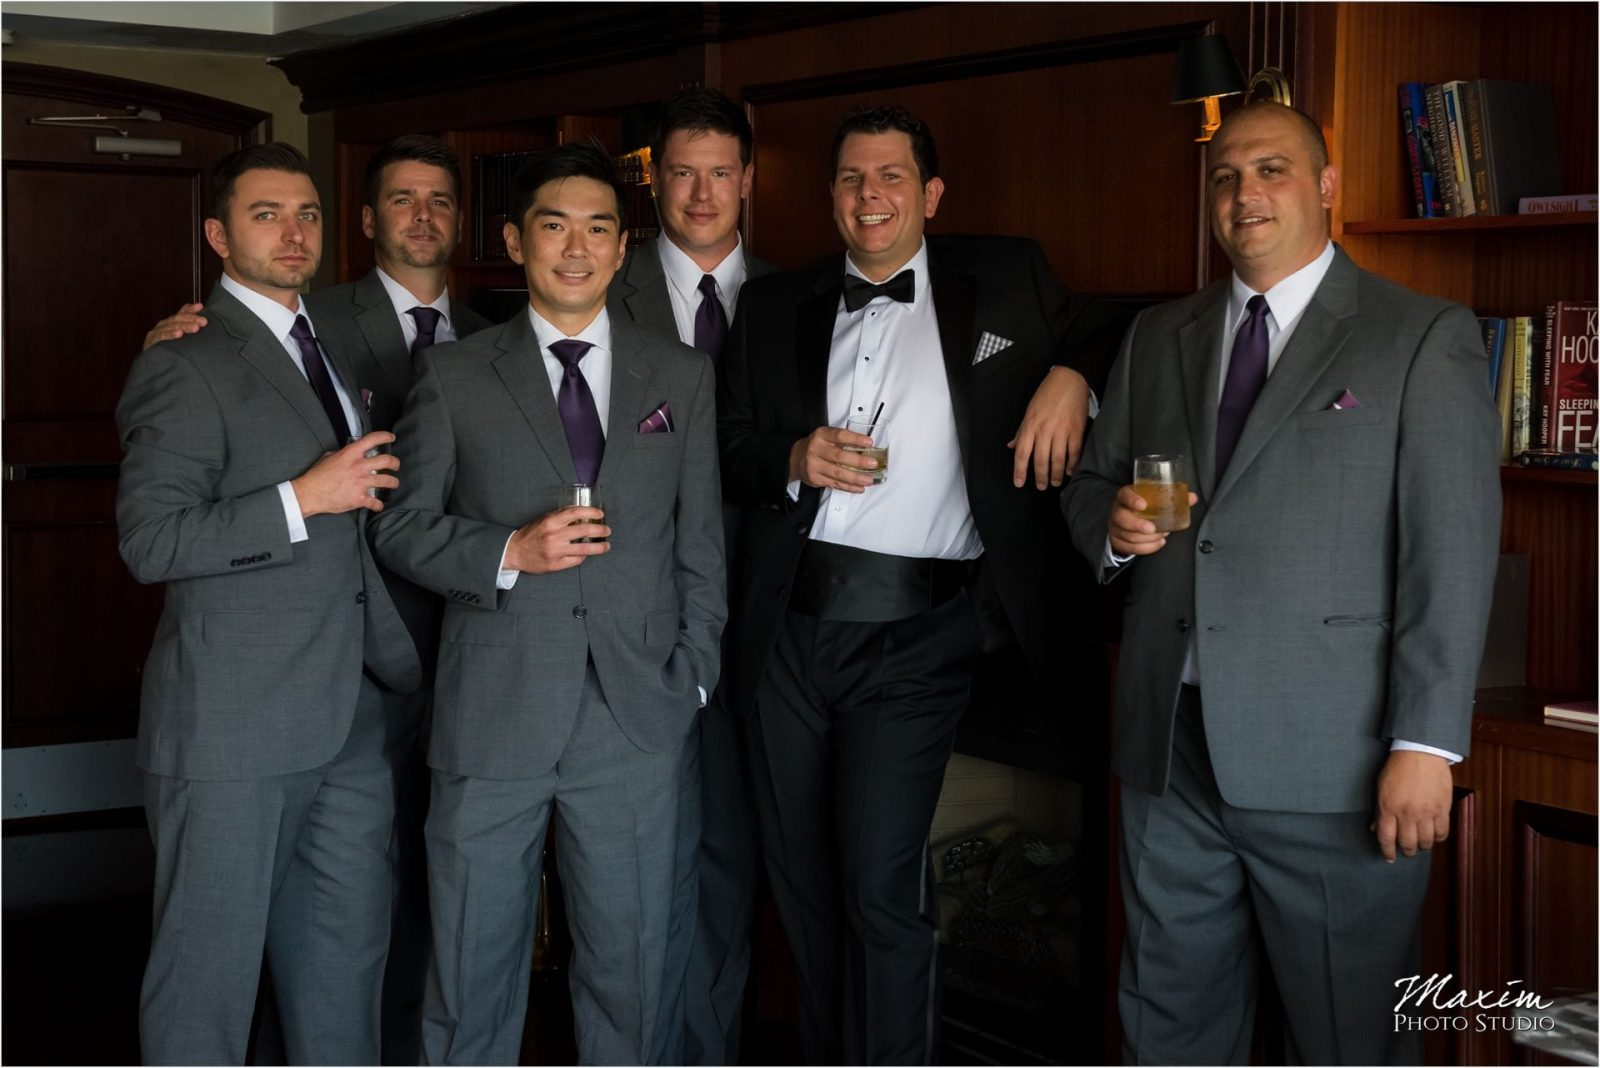 Marriott Rivercenter Covington, Cincinnati Wedding, Groomsmen